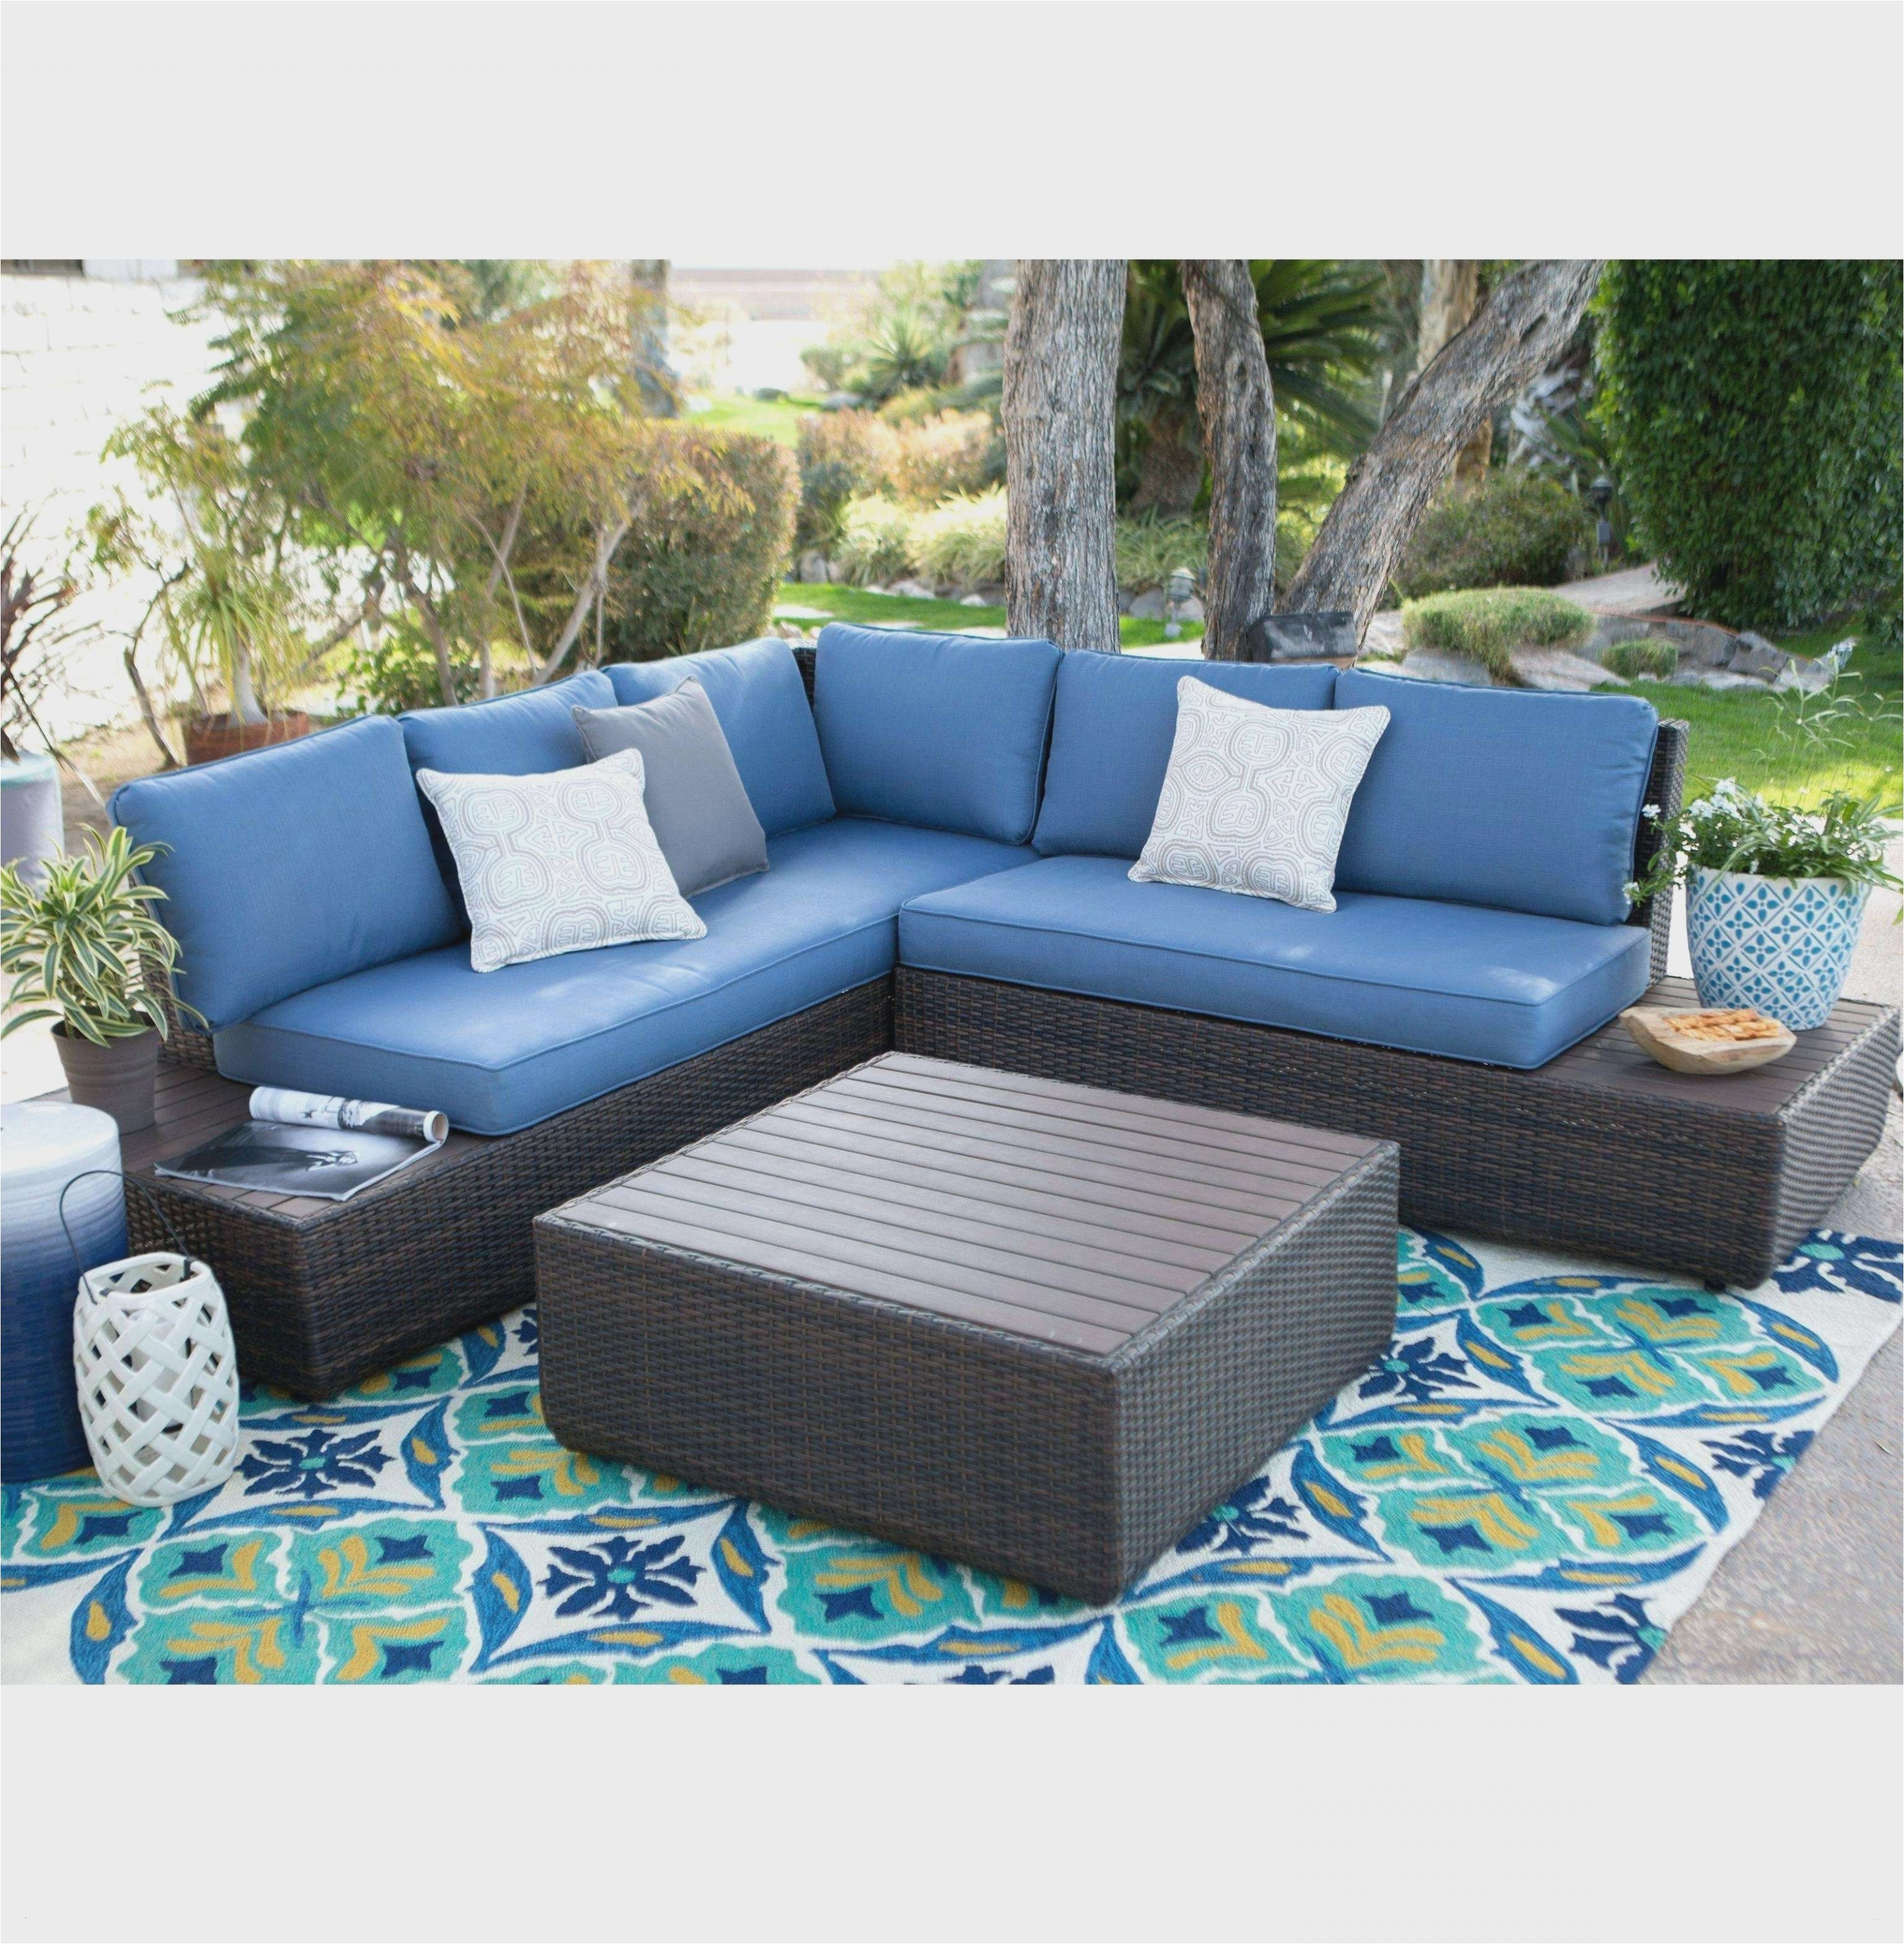 craigslist furniture for sale by owner inspirational popular 23 craigslist outdoor patio furniture home furniture ideas